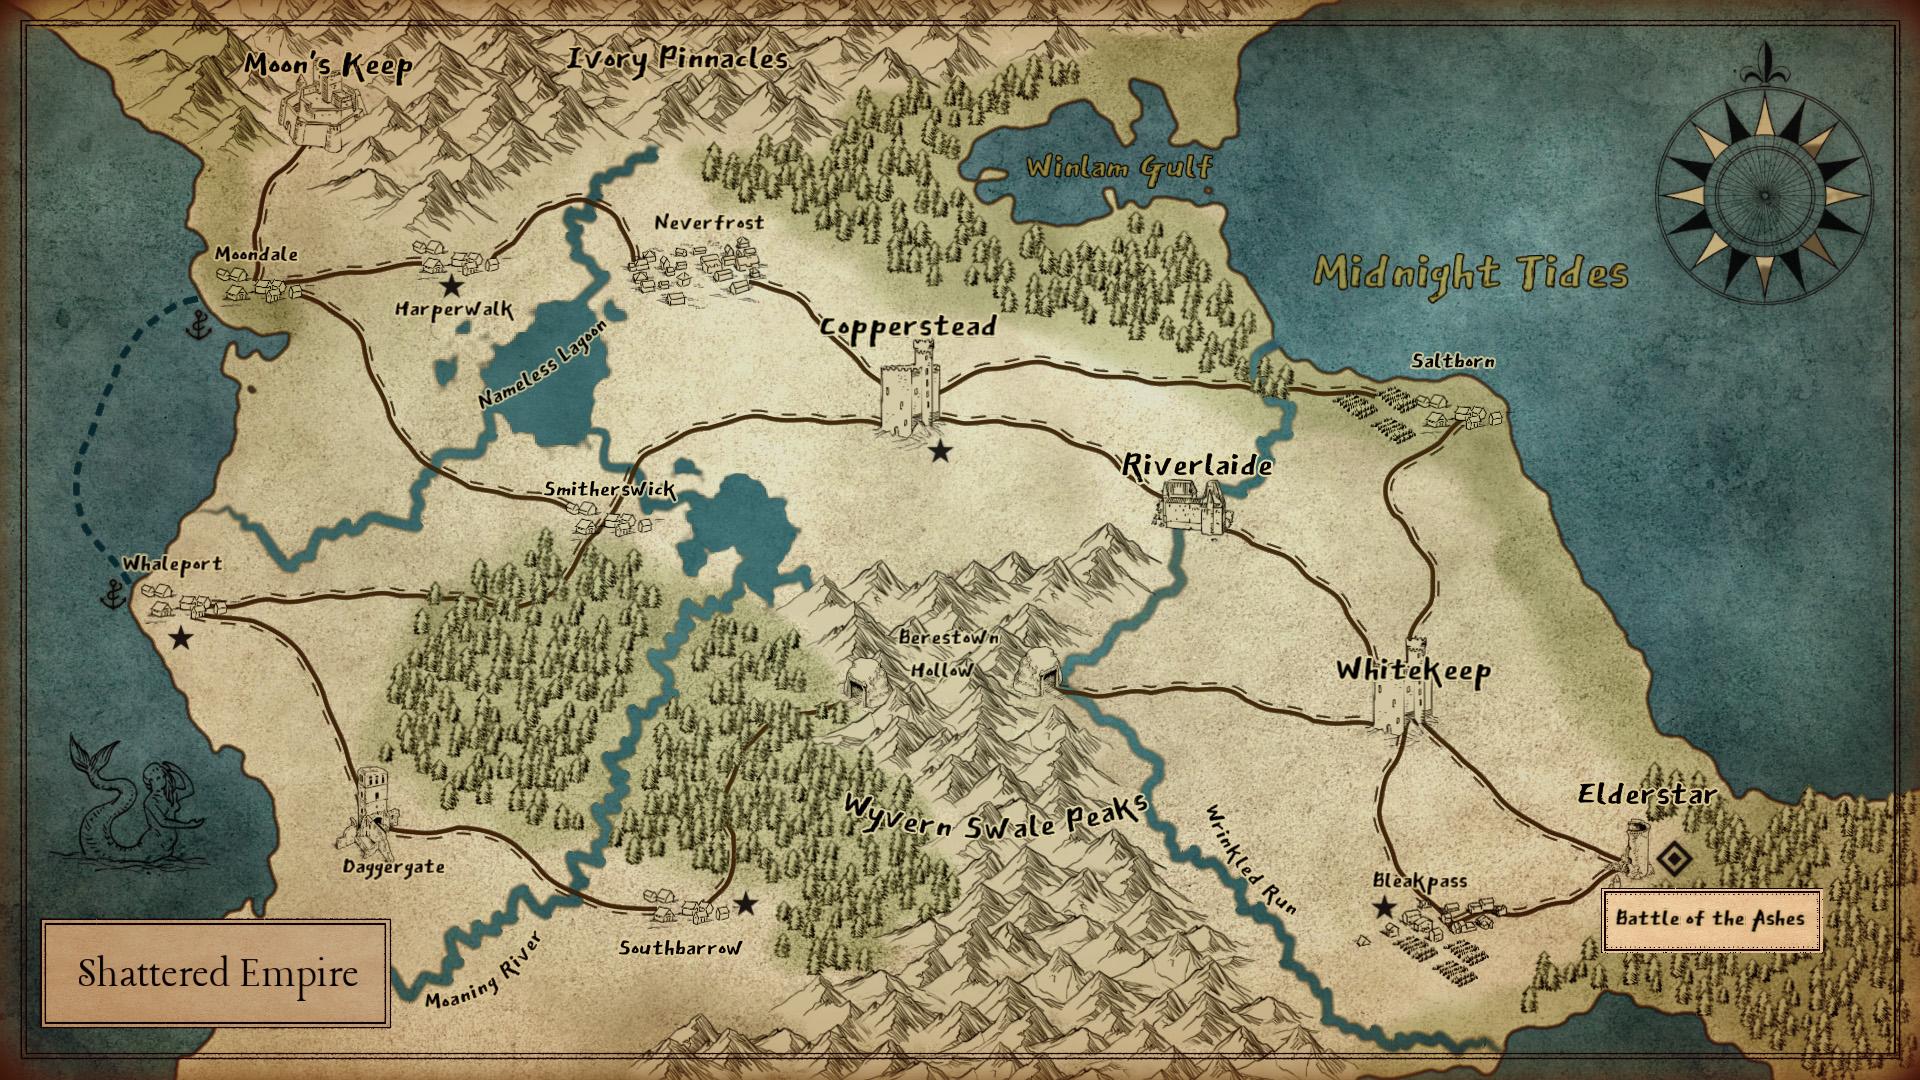 Memories of the Fallen - World Map